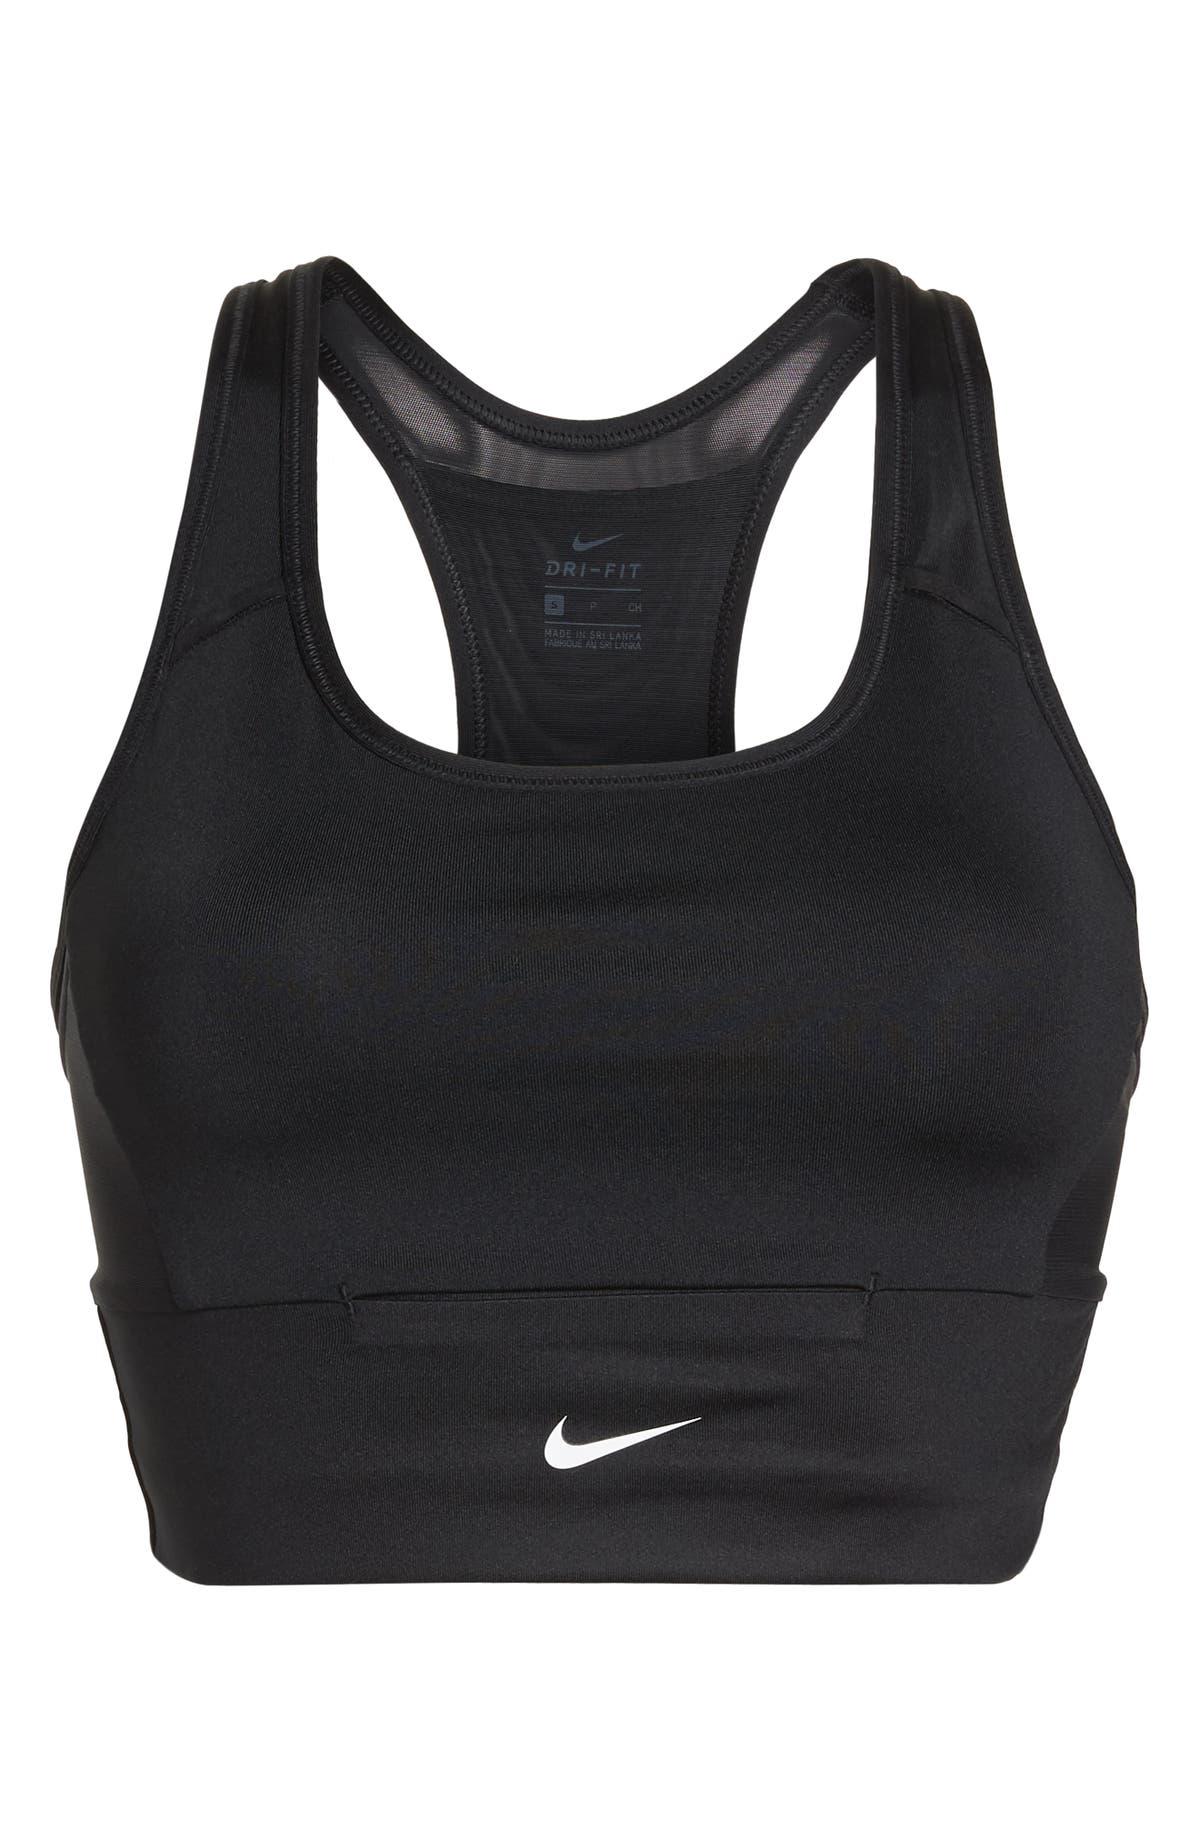 44e8bbd160465 Nike Swoosh Pocket Sports Bra